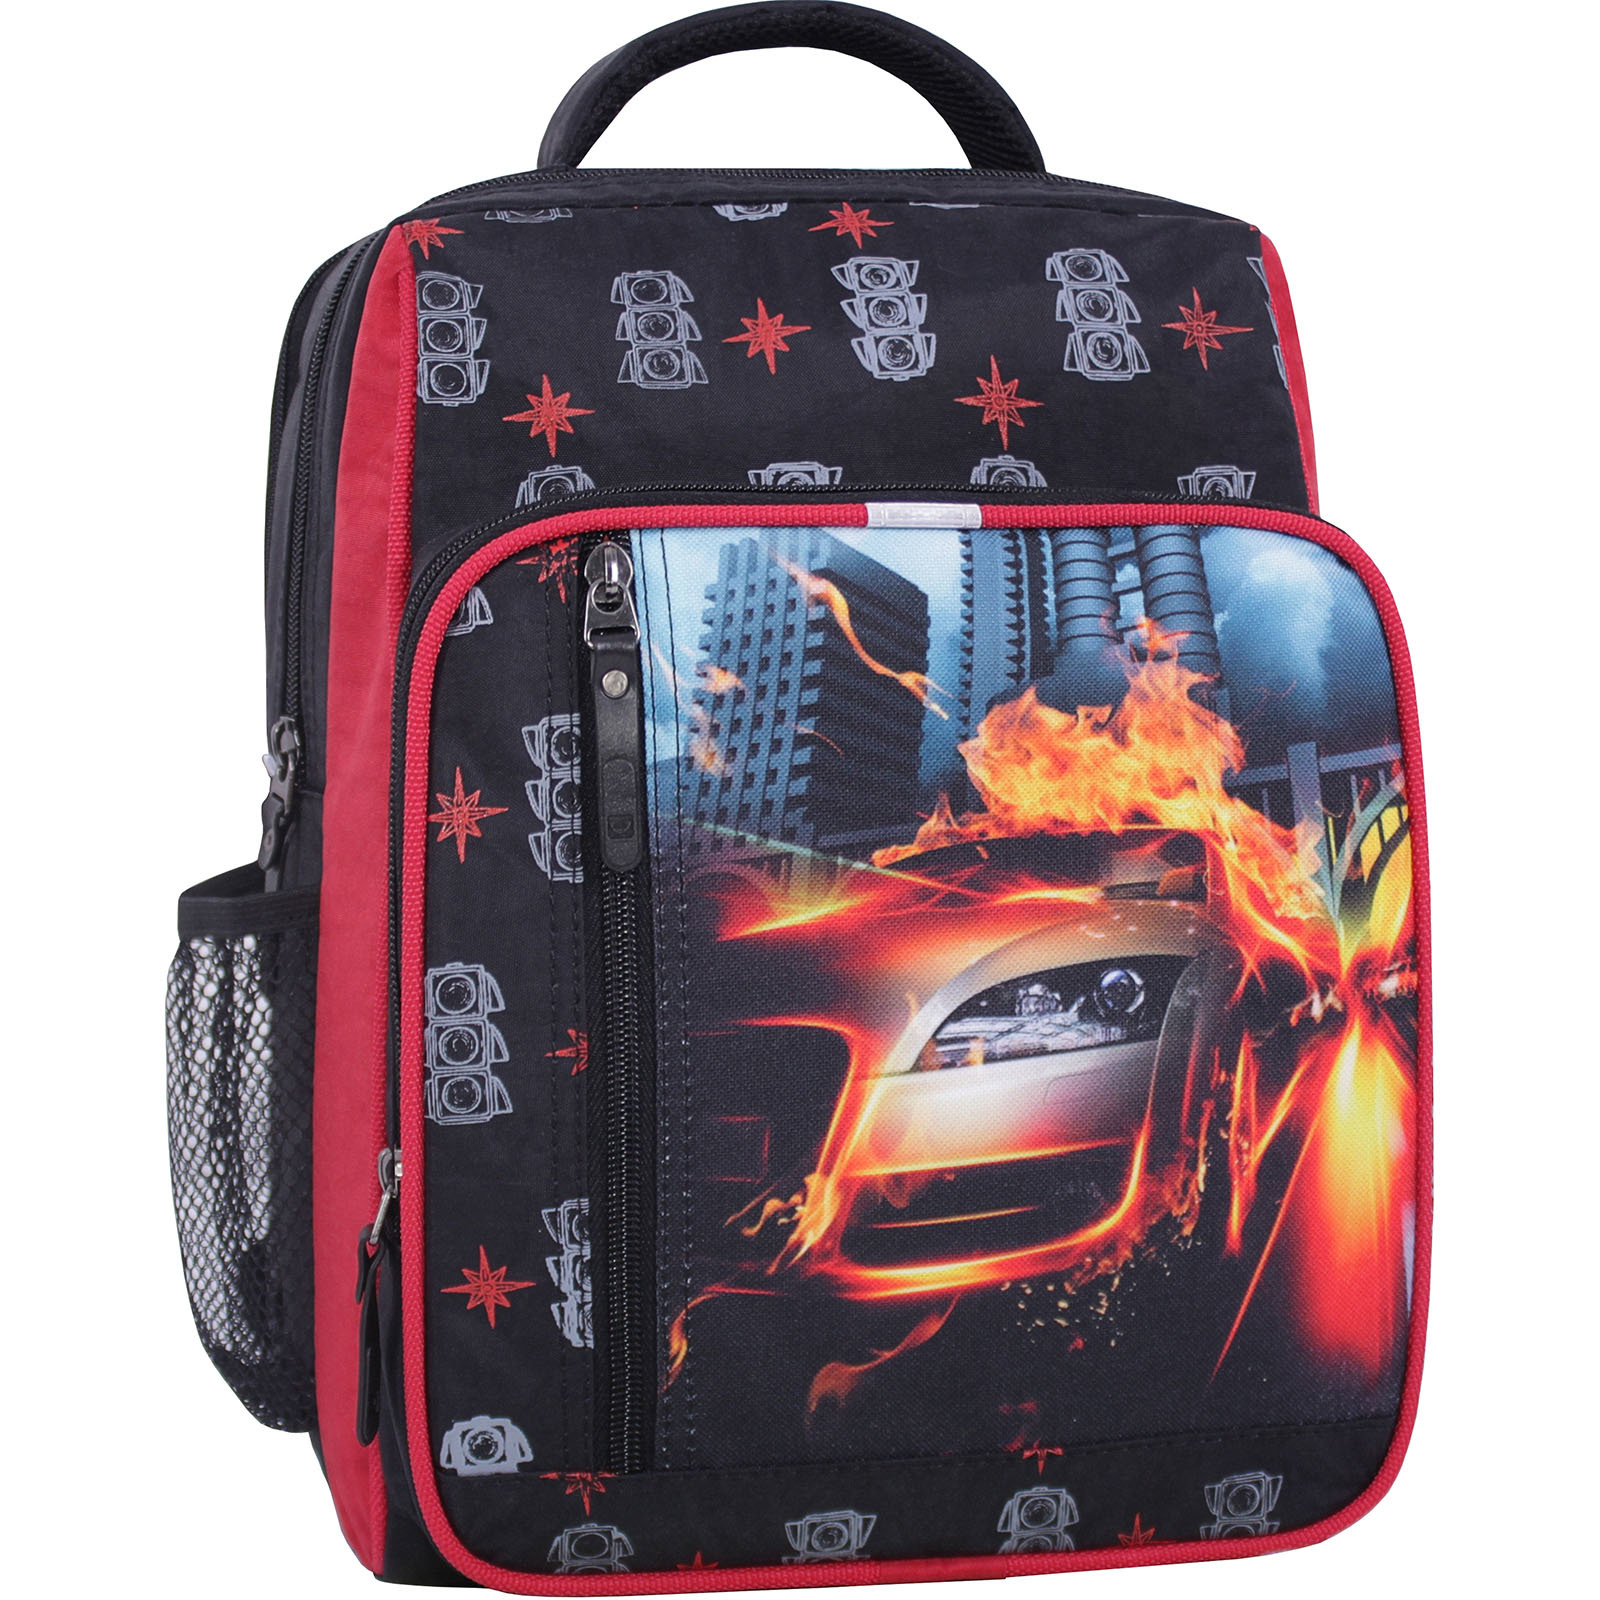 Школьные рюкзаки Рюкзак школьный Bagland Школьник 8 л. черный 500 (0012870) IMG_0986_суб.500_.JPG